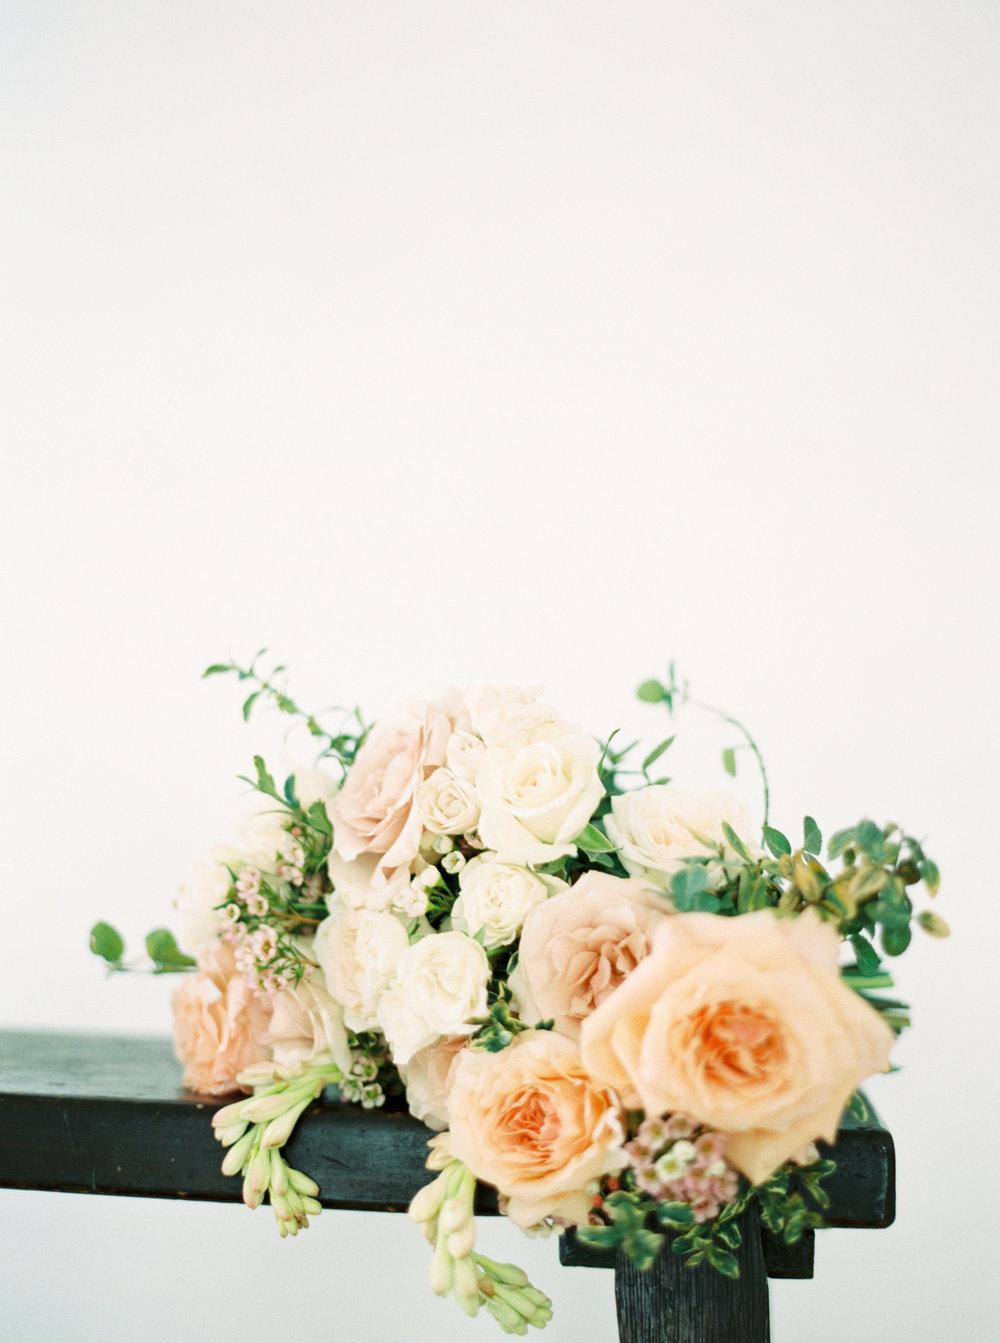 Owensboro Evansville Henderson Newburgh Wedding Flowers Florist00046.jpg